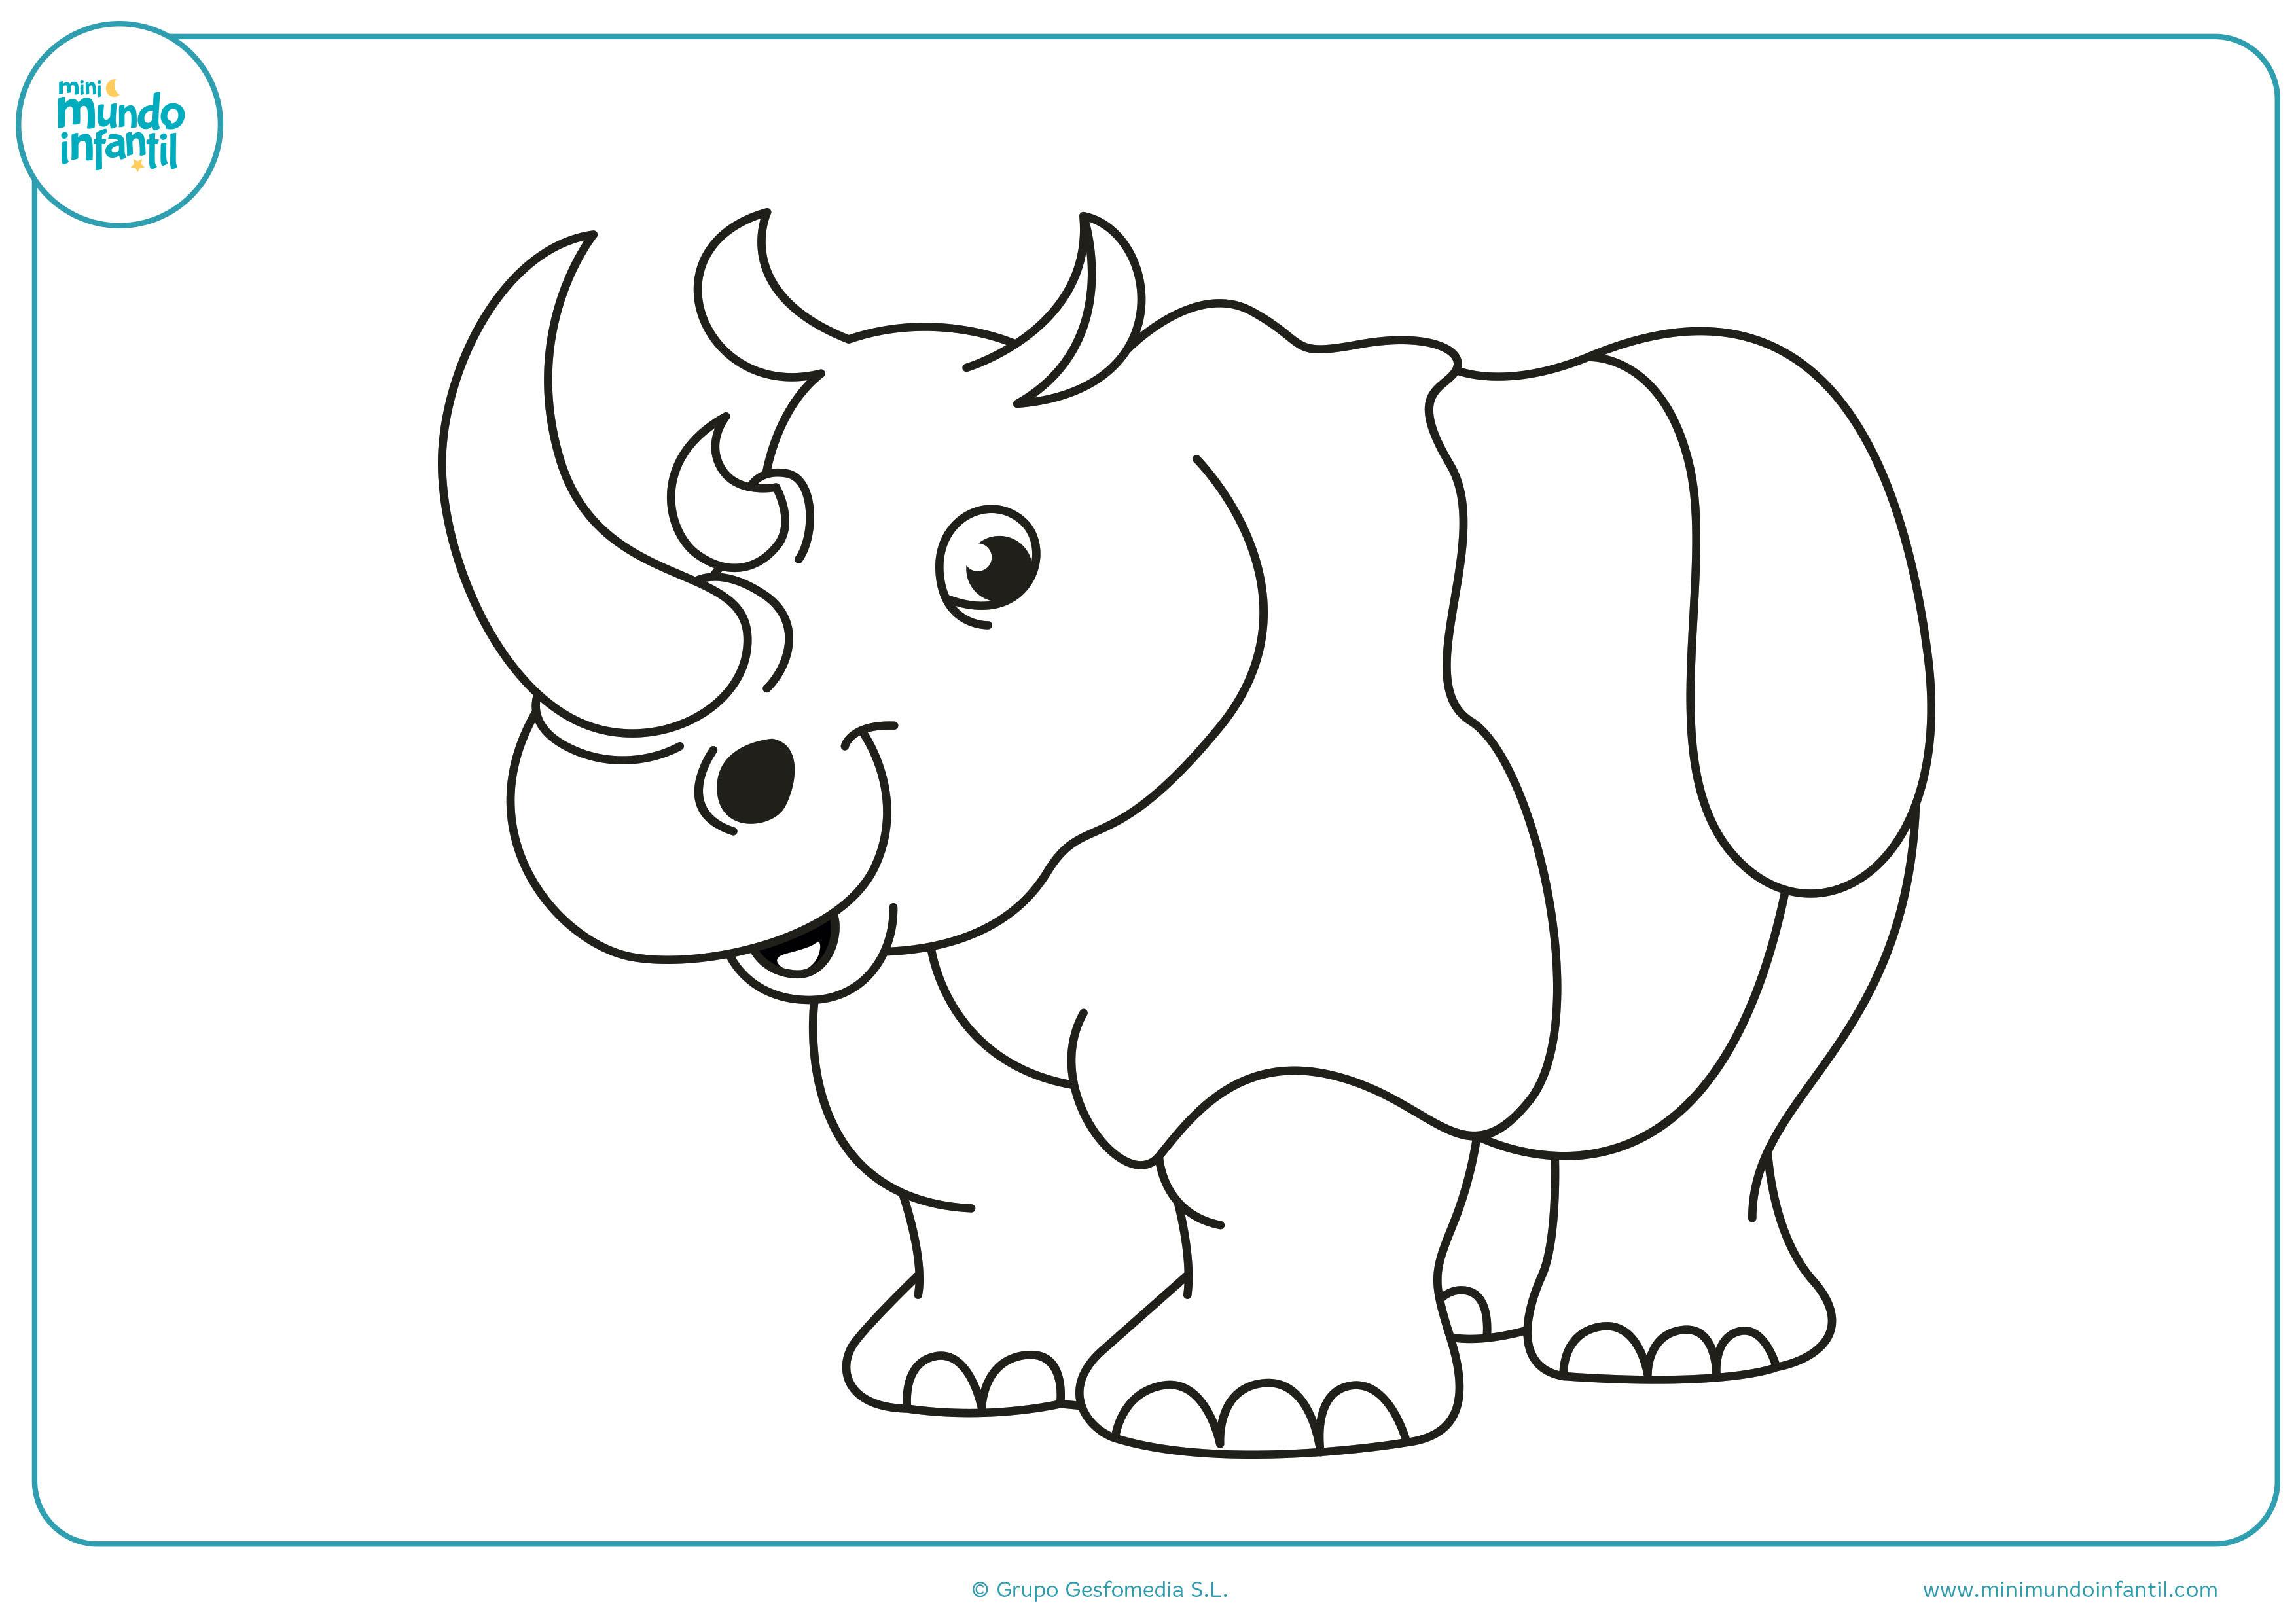 Dibujos De Animales De La Selva Para Colorear Mundo Primaria Dibujos De Animales Animales De La Selva Dibujos